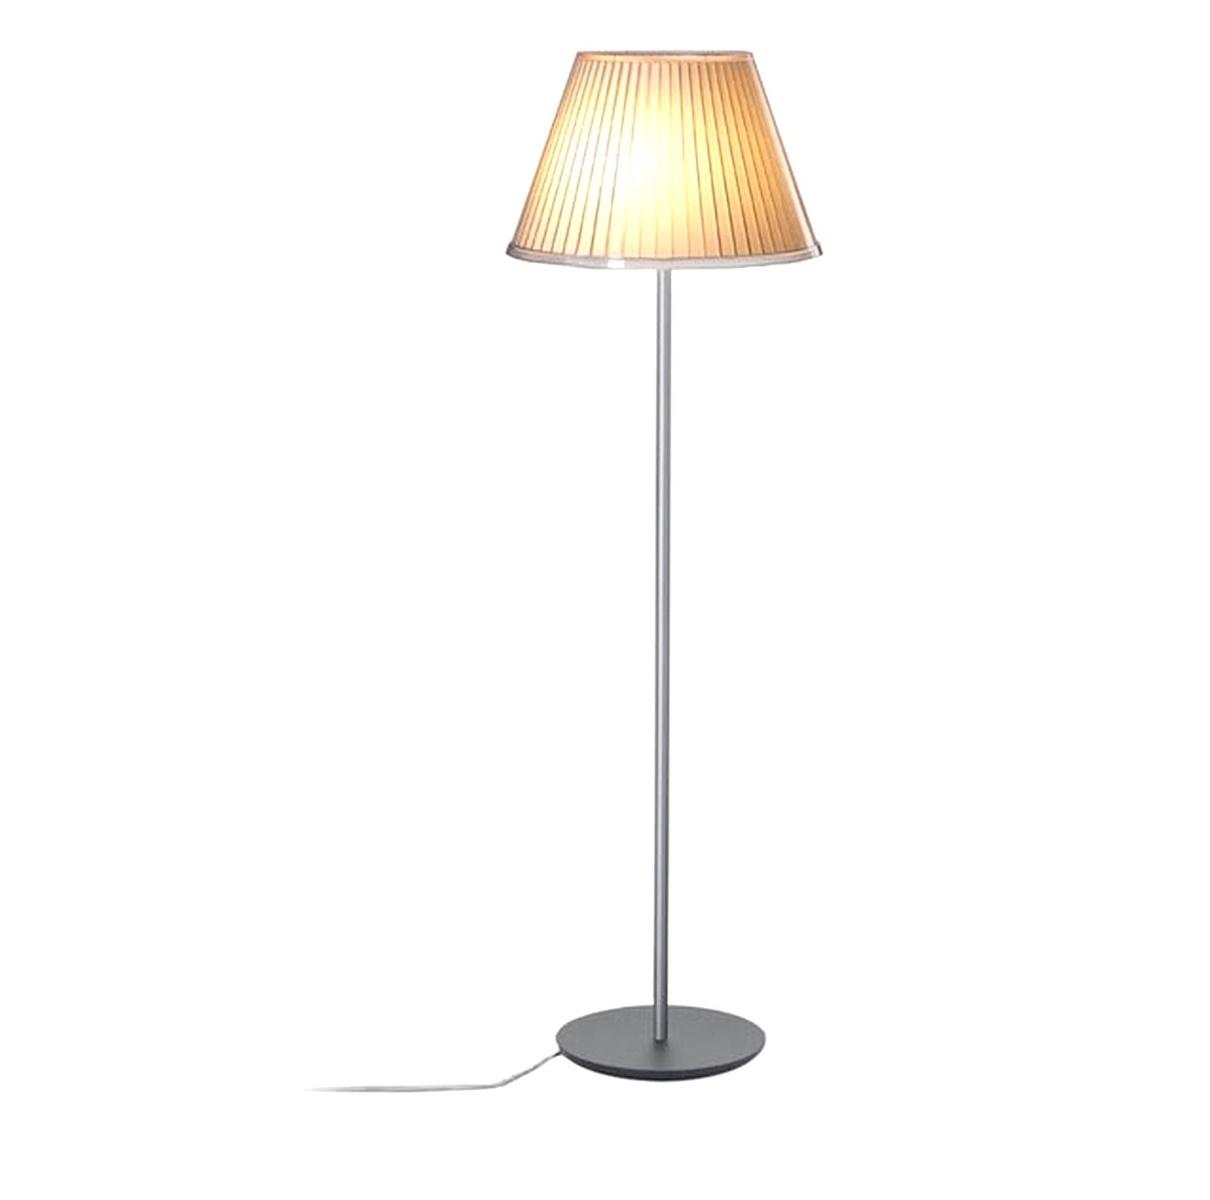 Artemide Choose Pendant Lamp Diffuser en 1123020A